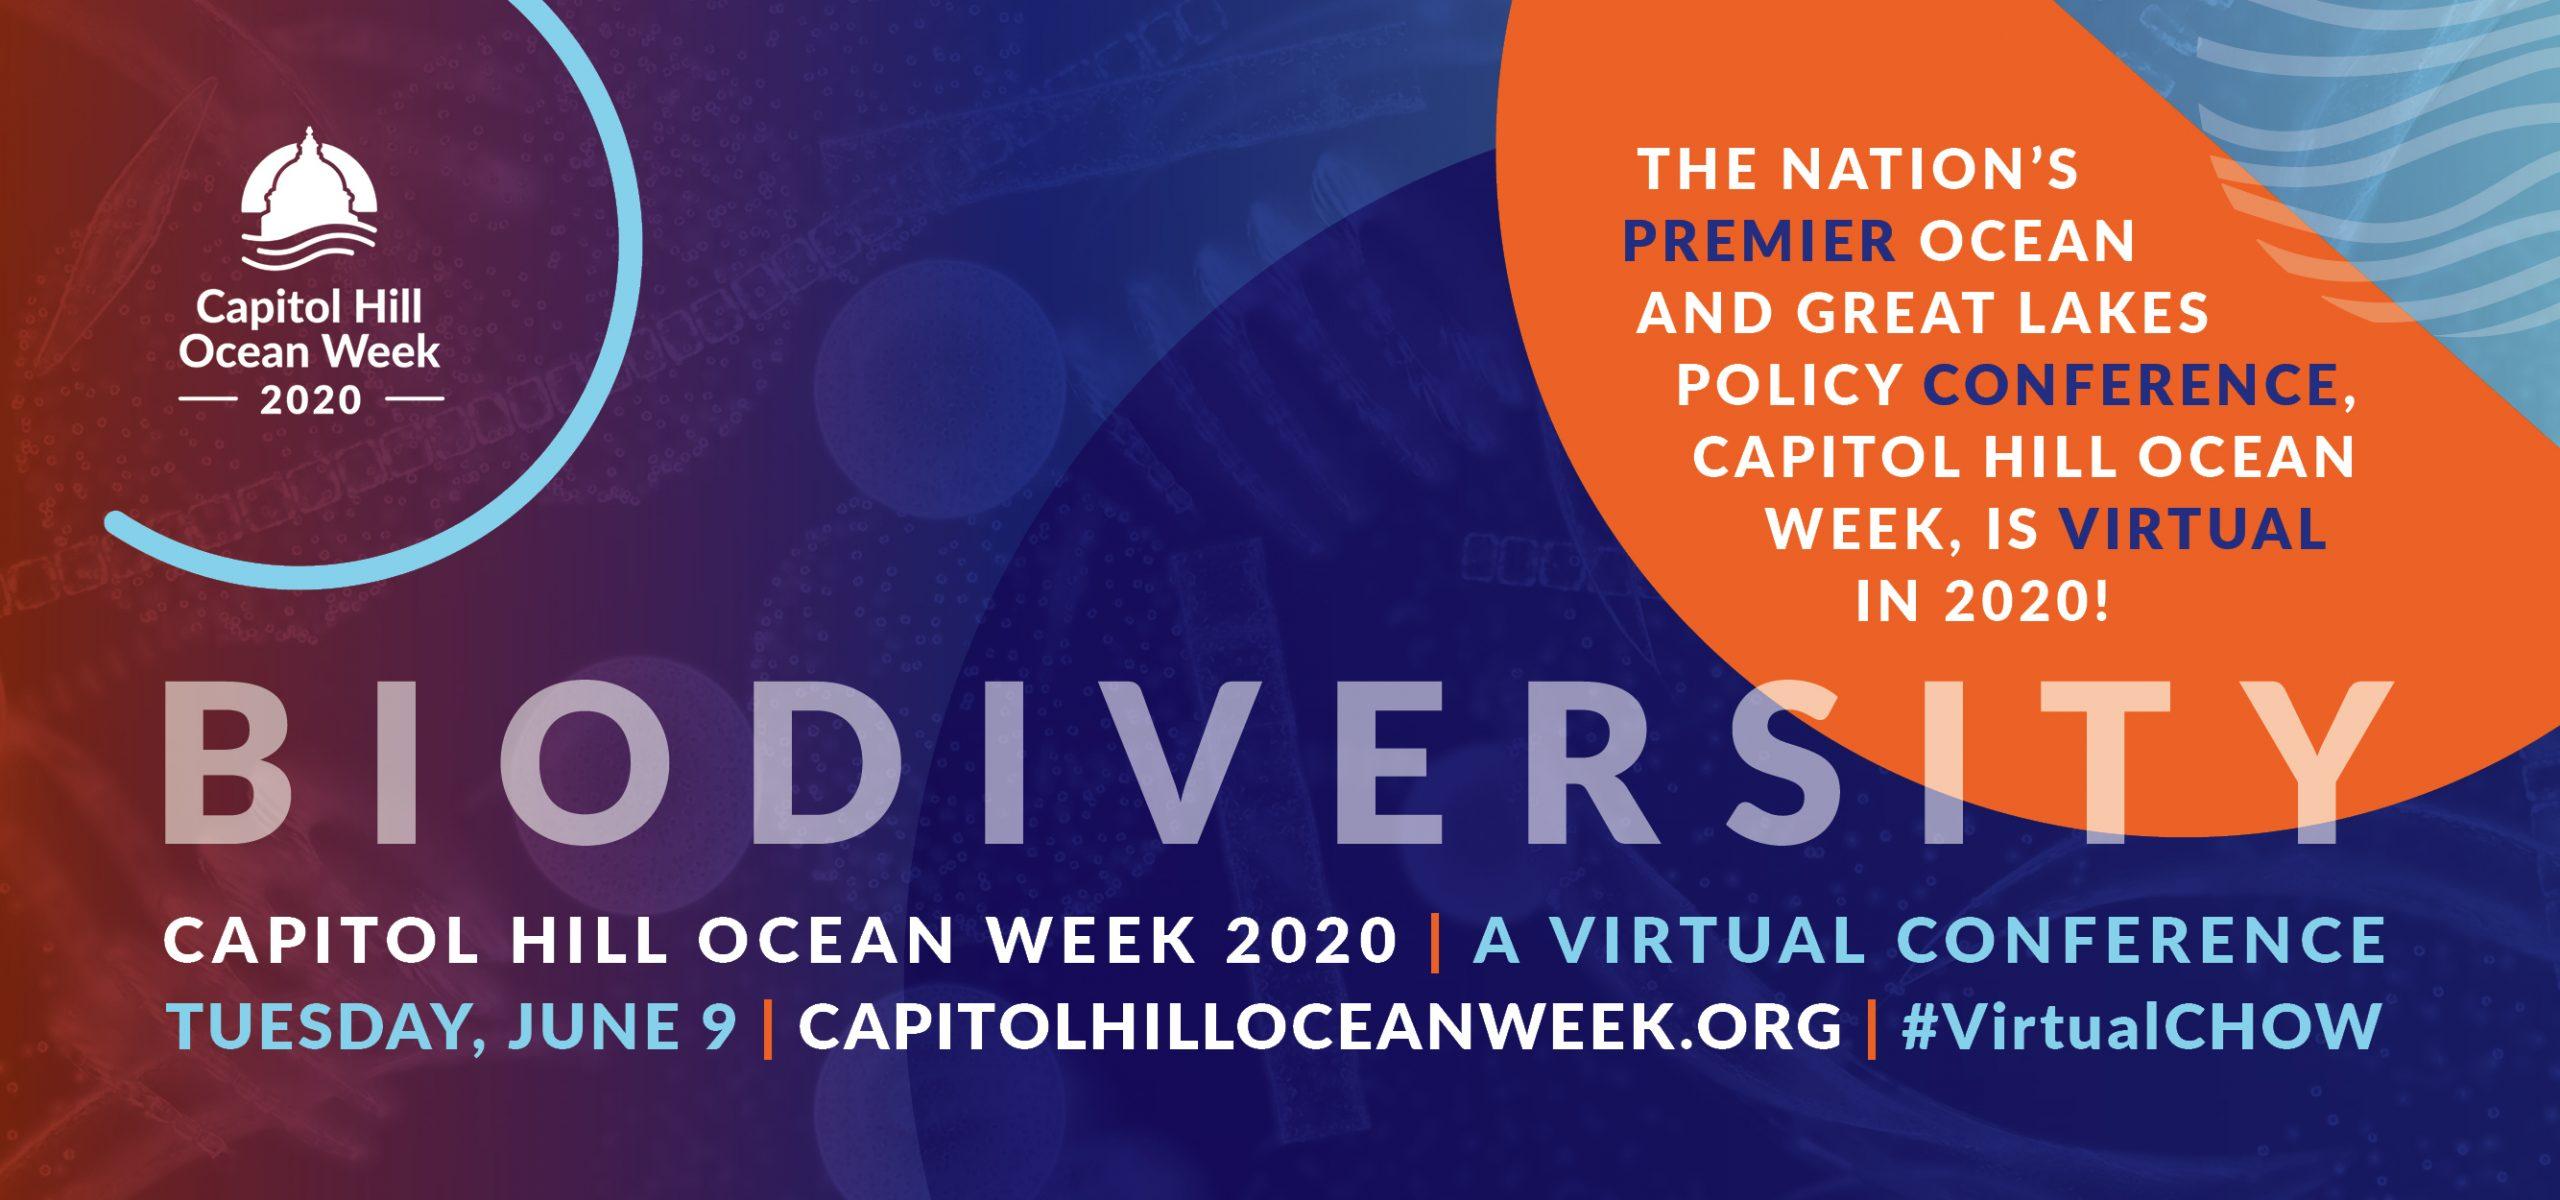 Capital Hill Oceans Week 2020